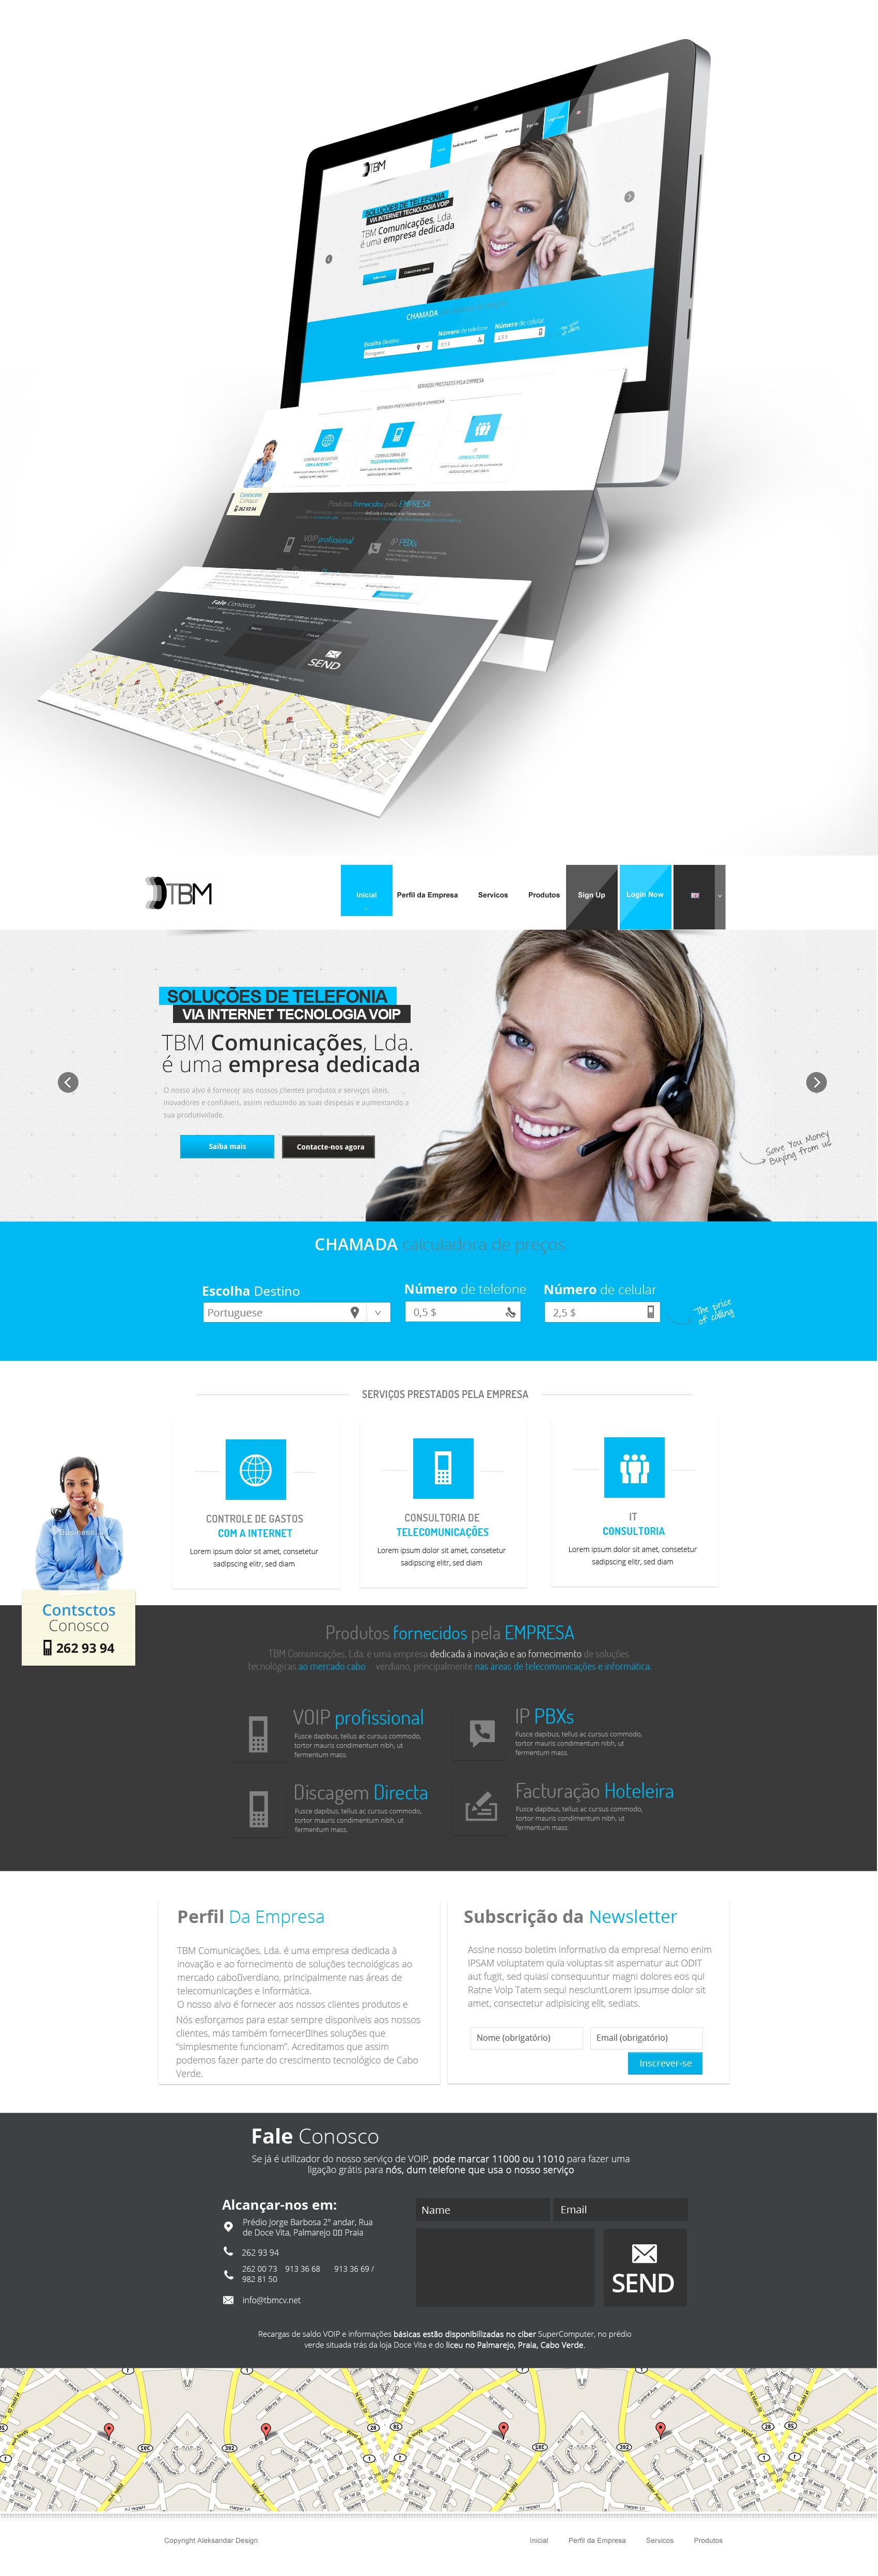 tbm_voip_web_design_by_vasiligfx-d6180vg.jpg